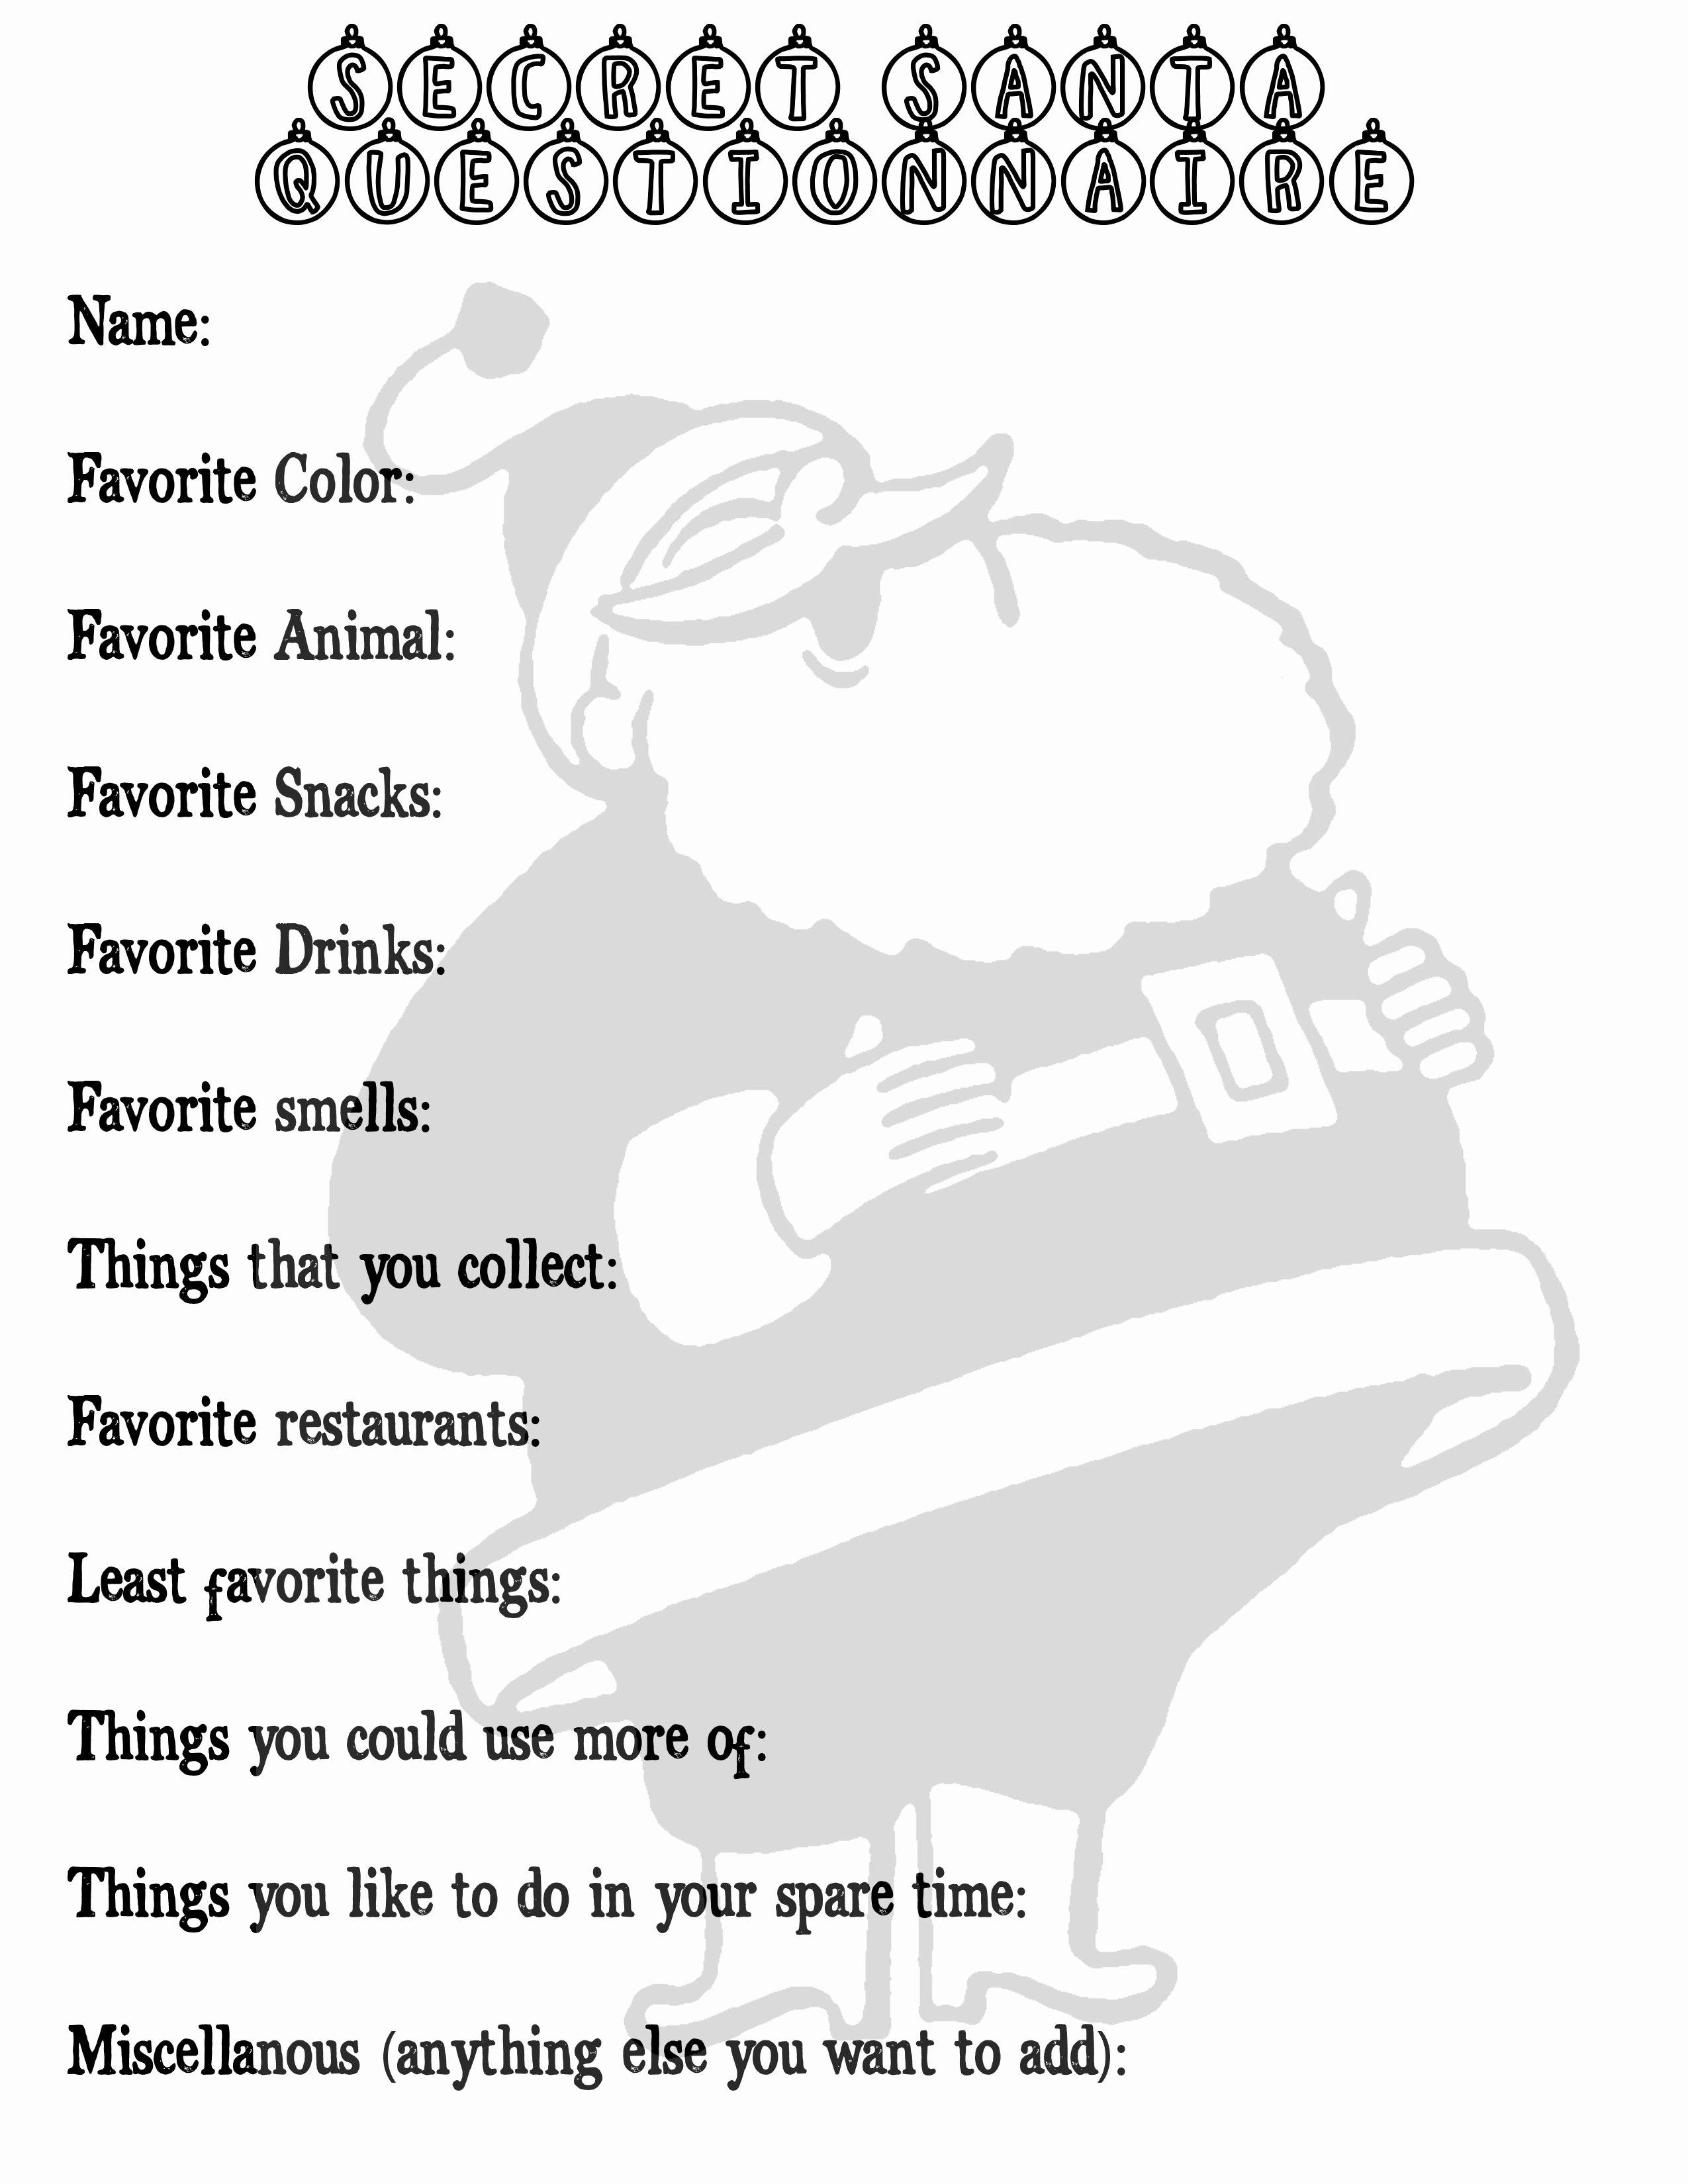 Gift Exchange Wish List Template Beautiful Secret Santa Questionnaire Printable Printable Pages